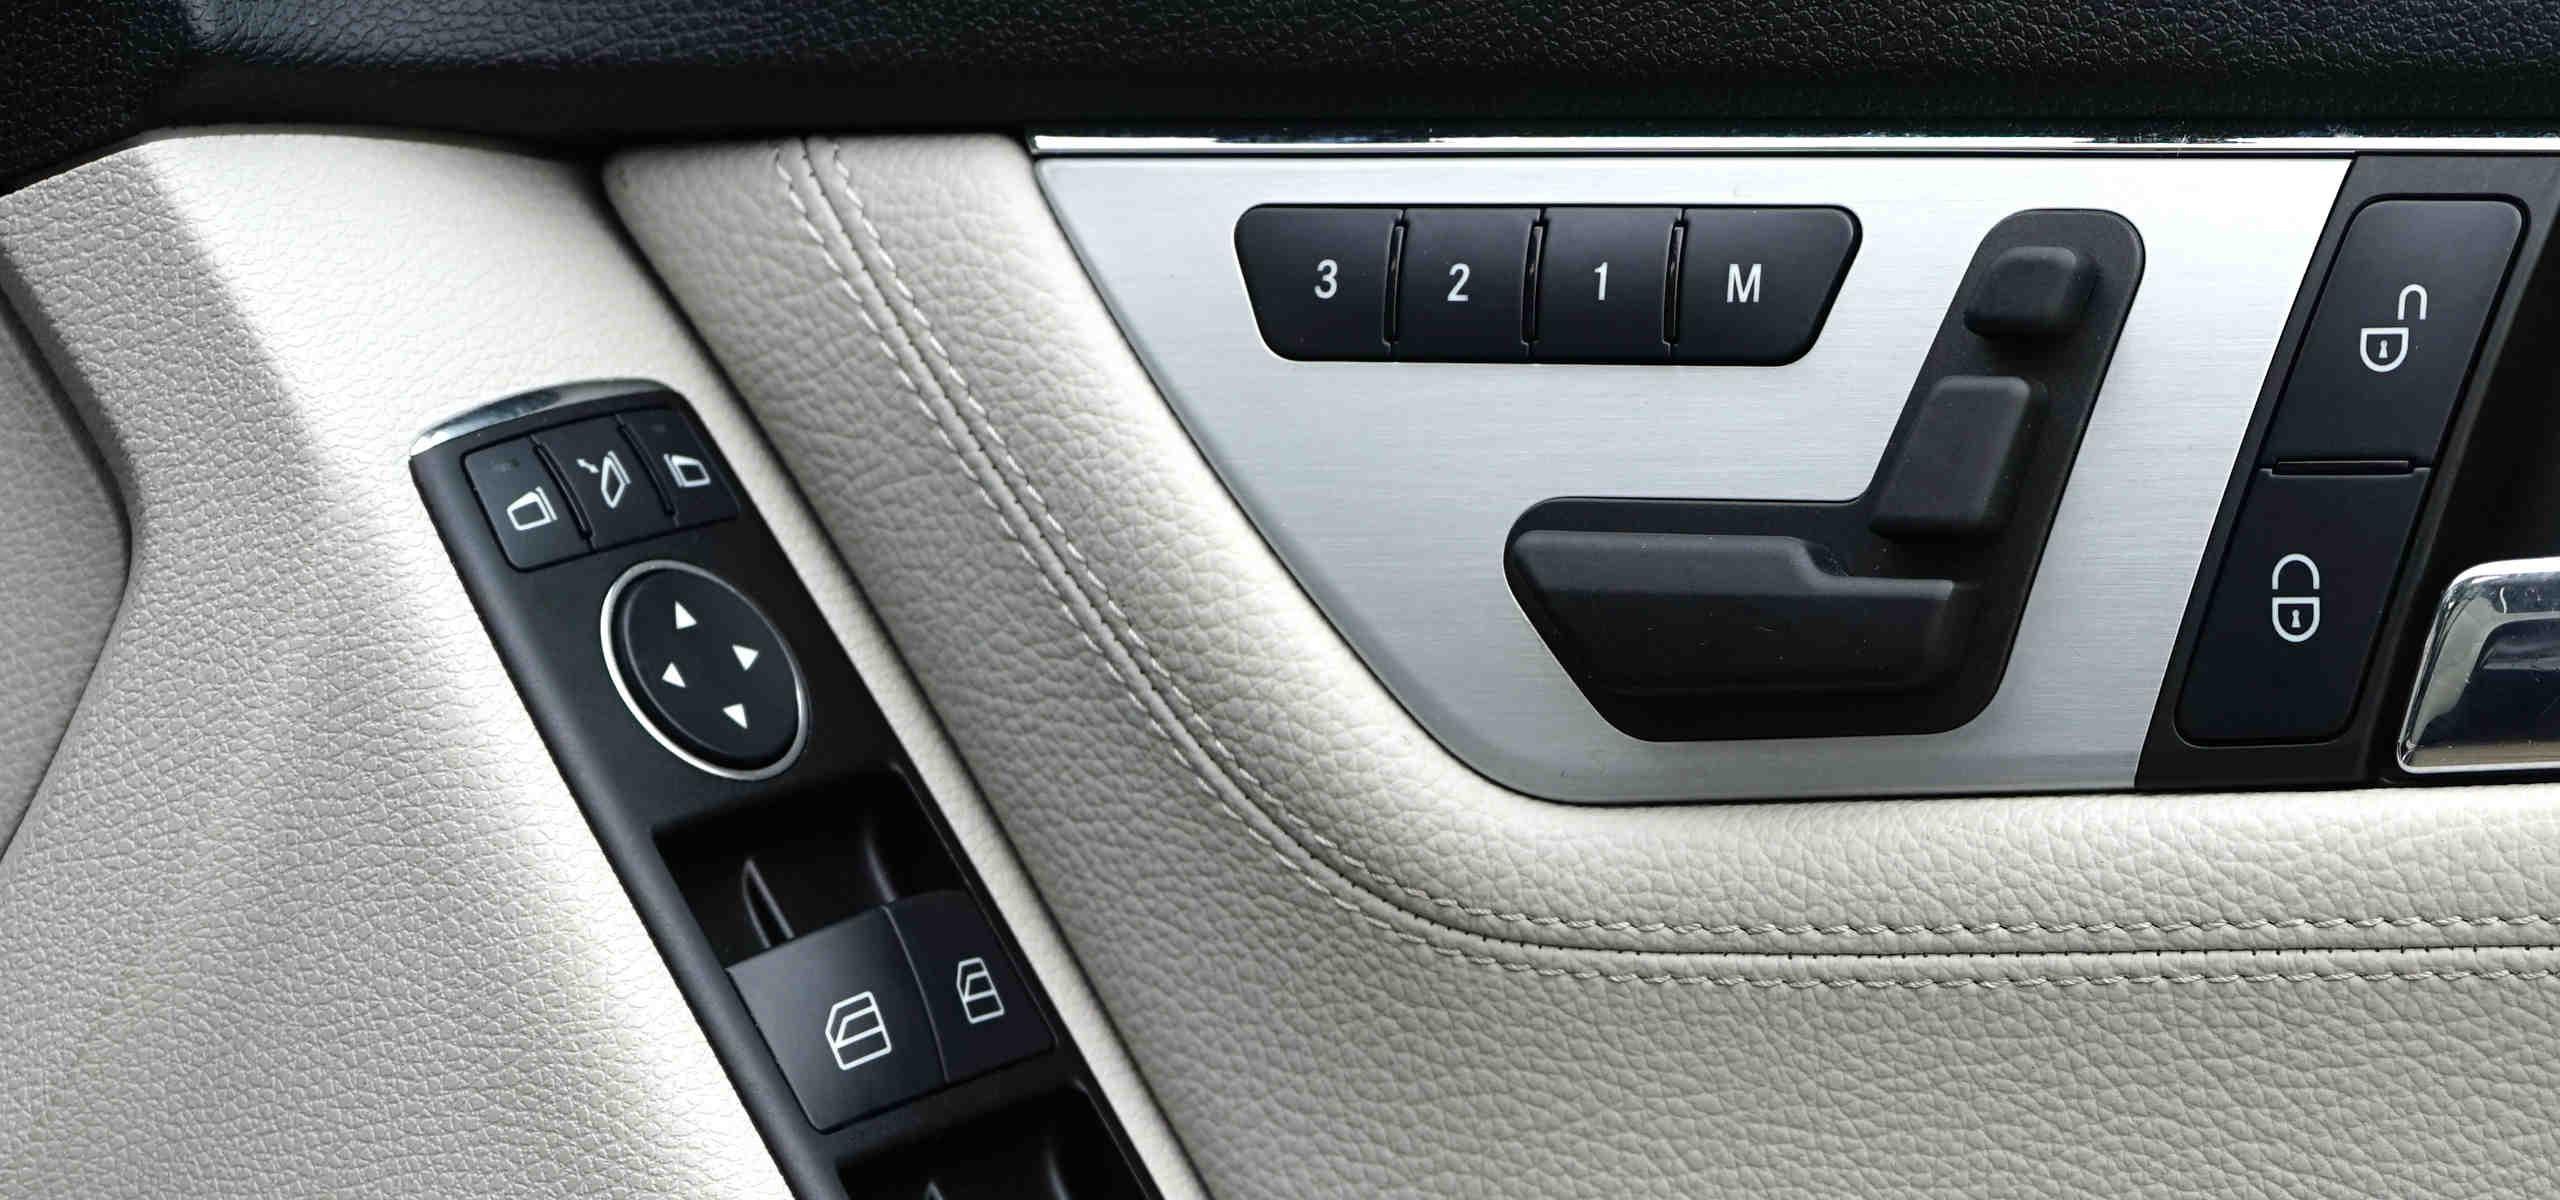 Diagram Of Car Lock Car Door Lock M3 Car Door Lock Motor Quality Central Locking Of Diagram Of Car Lock